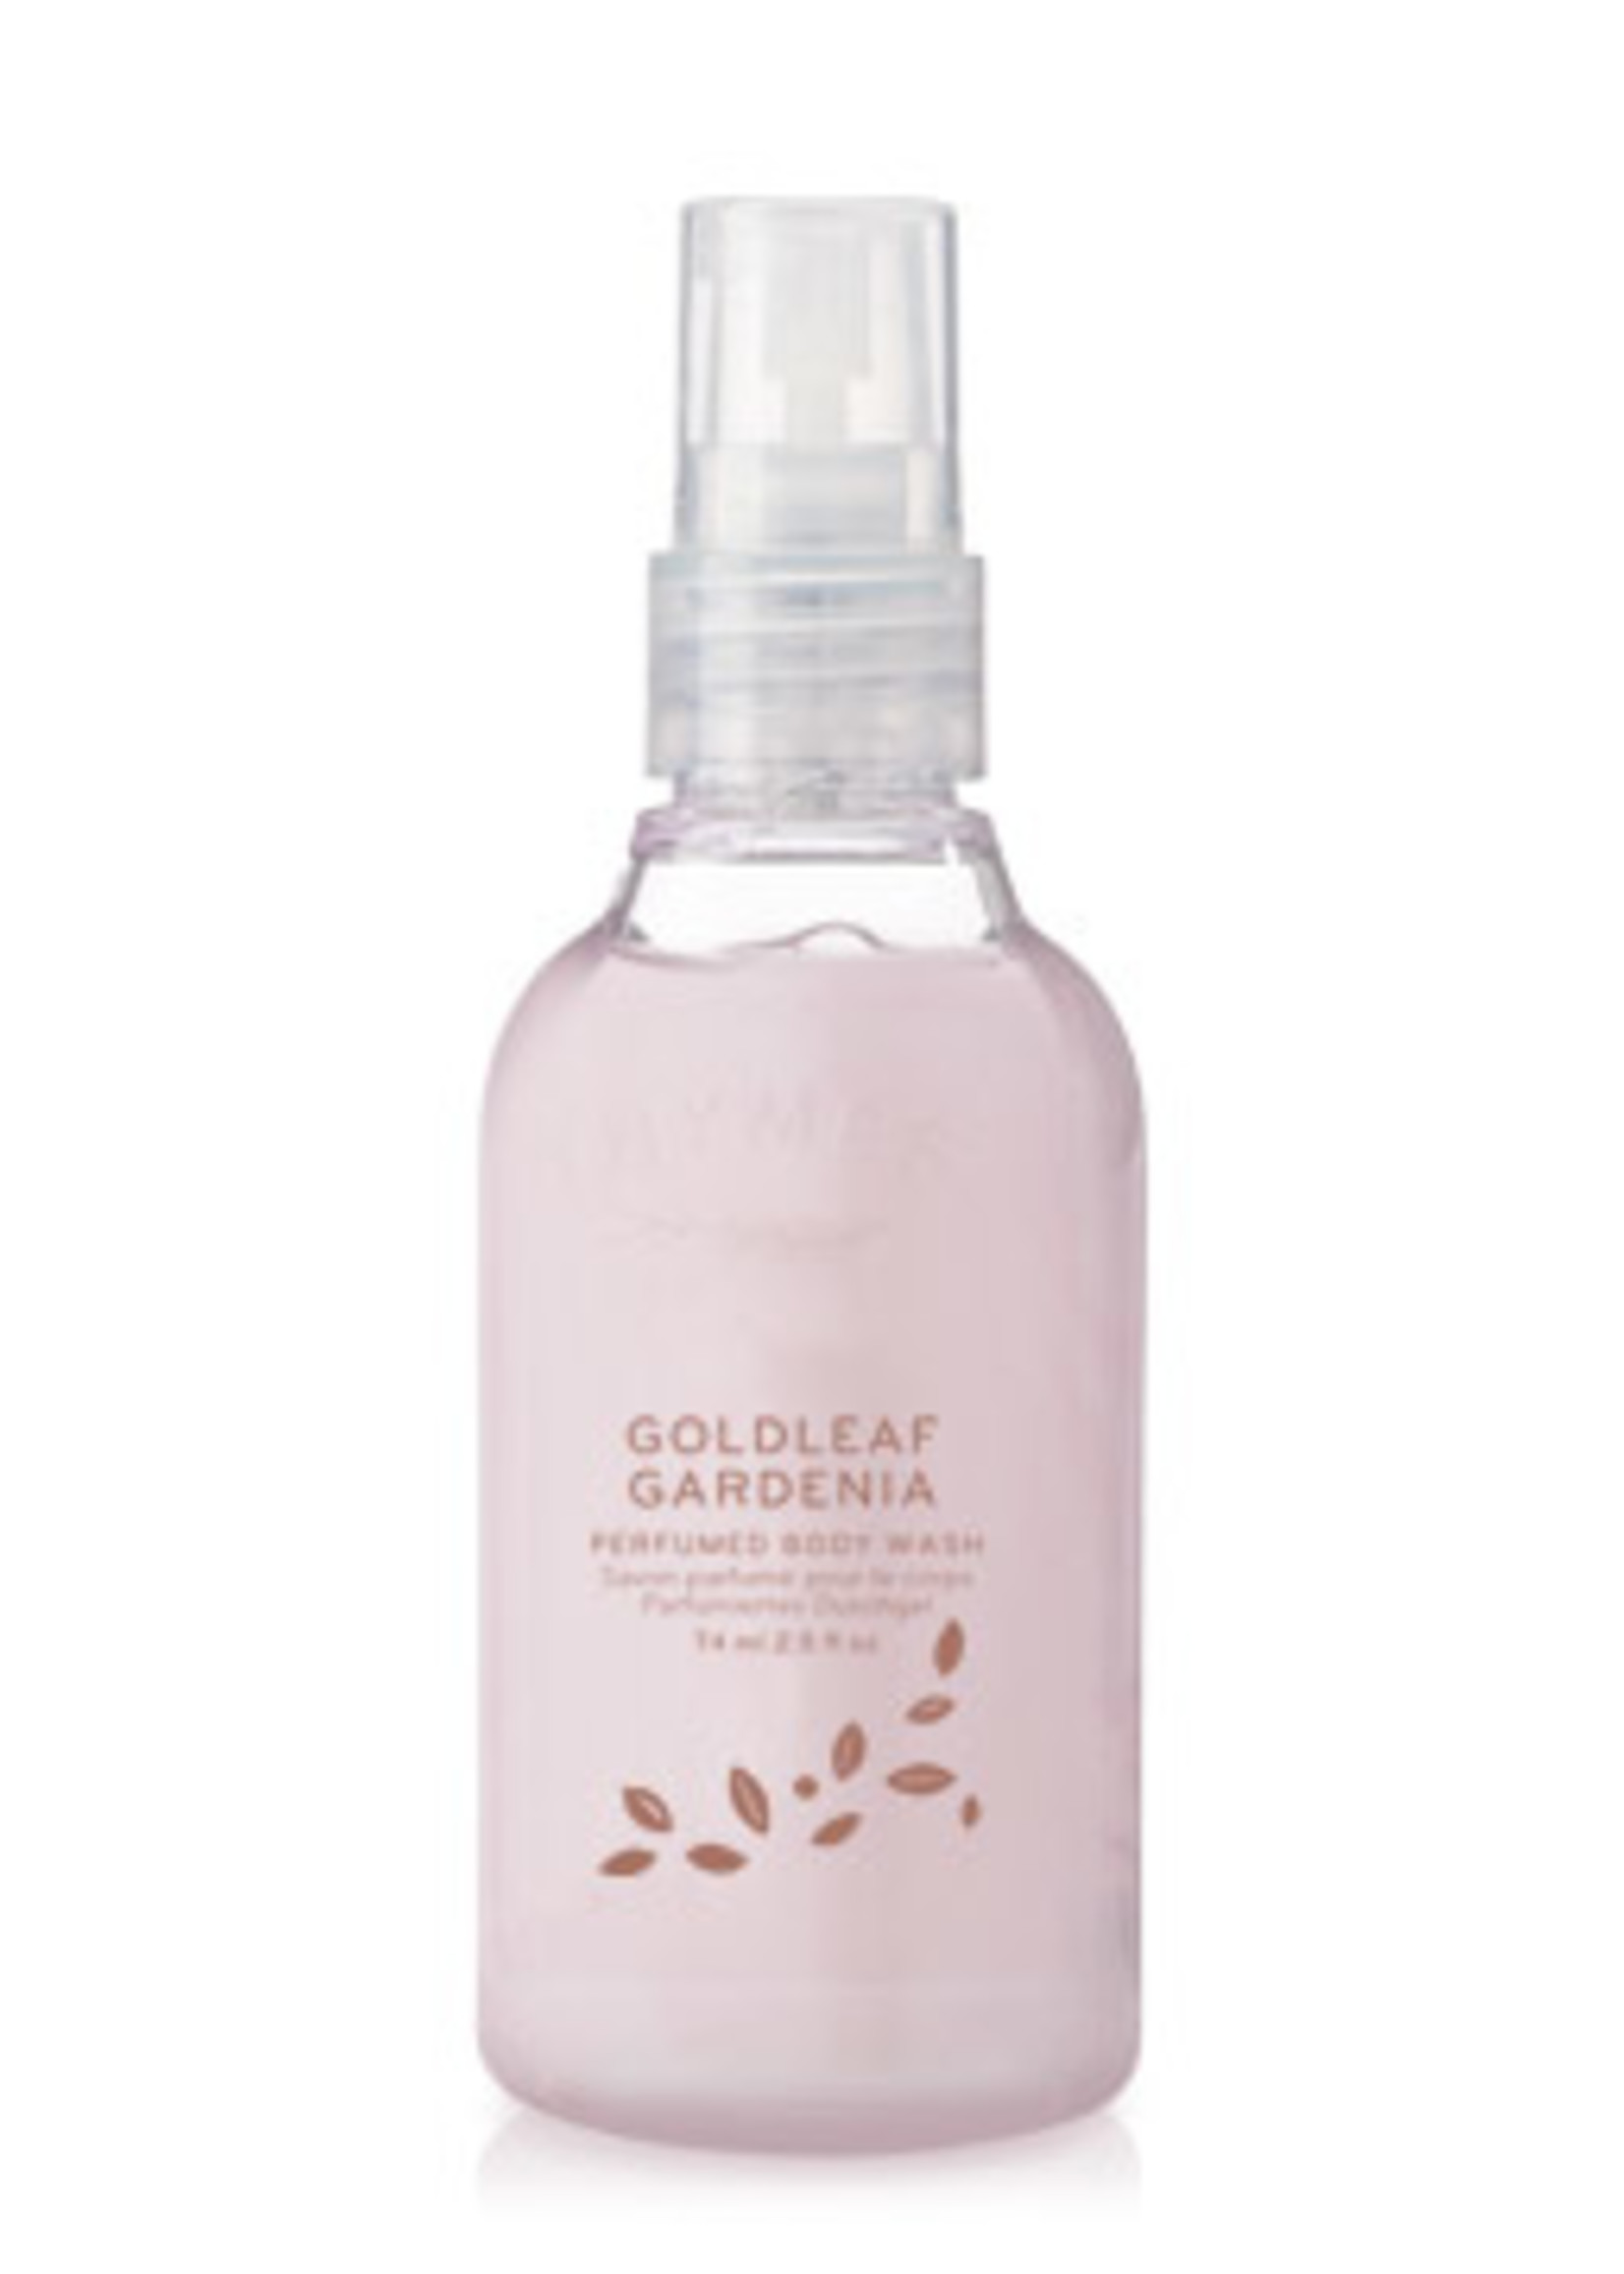 Thymes Goldleaf Gardenia Petite Body Wash